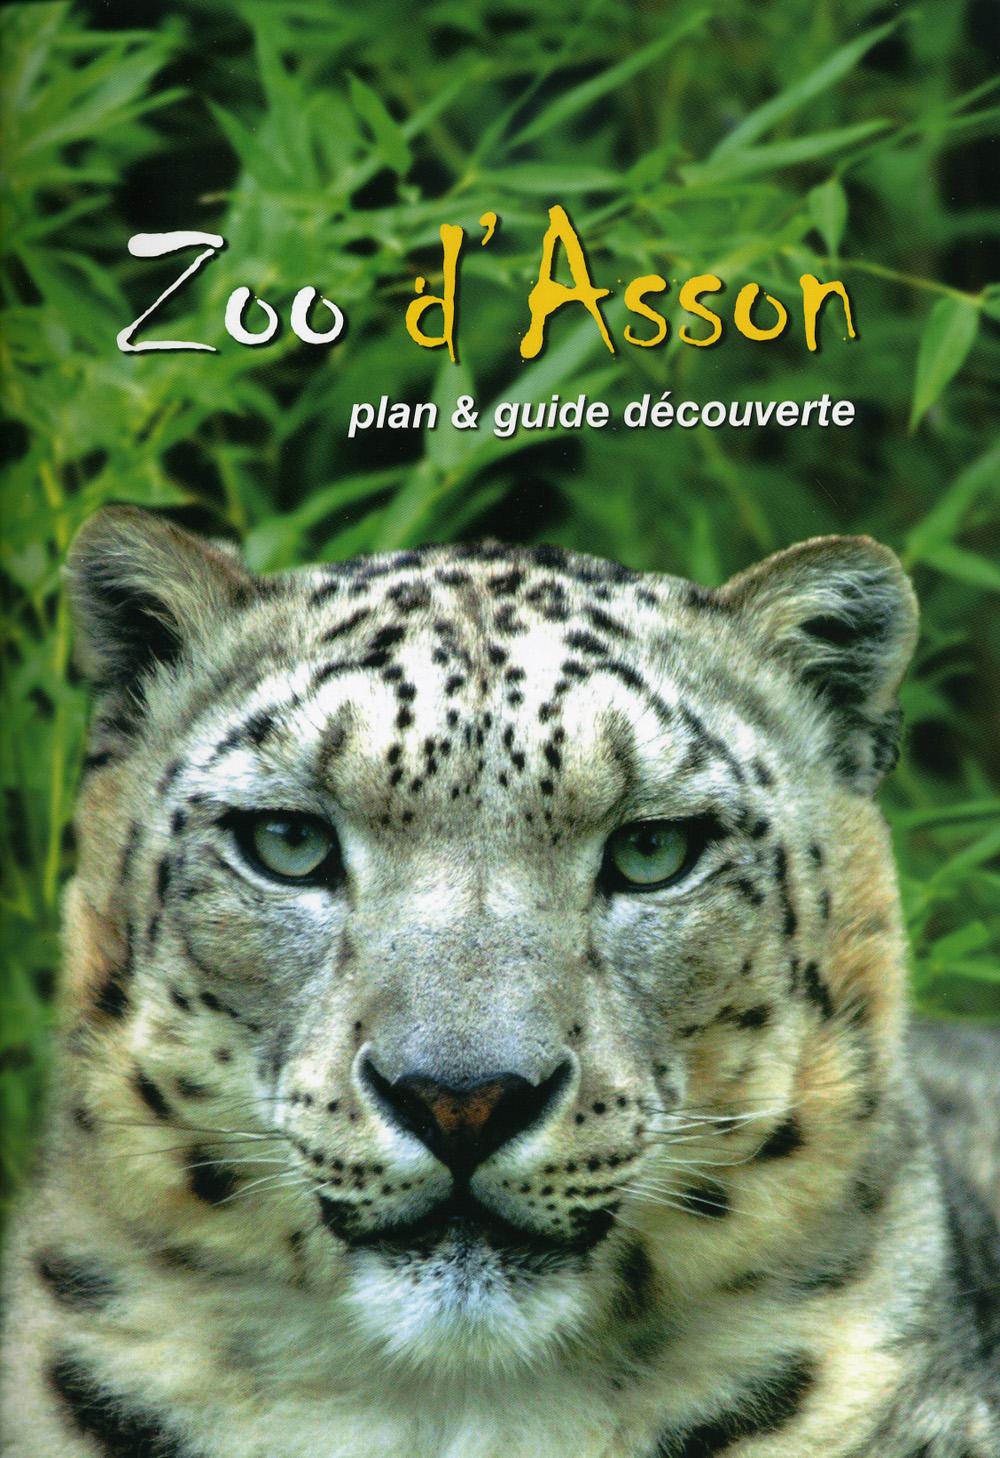 Zoo d'Asson